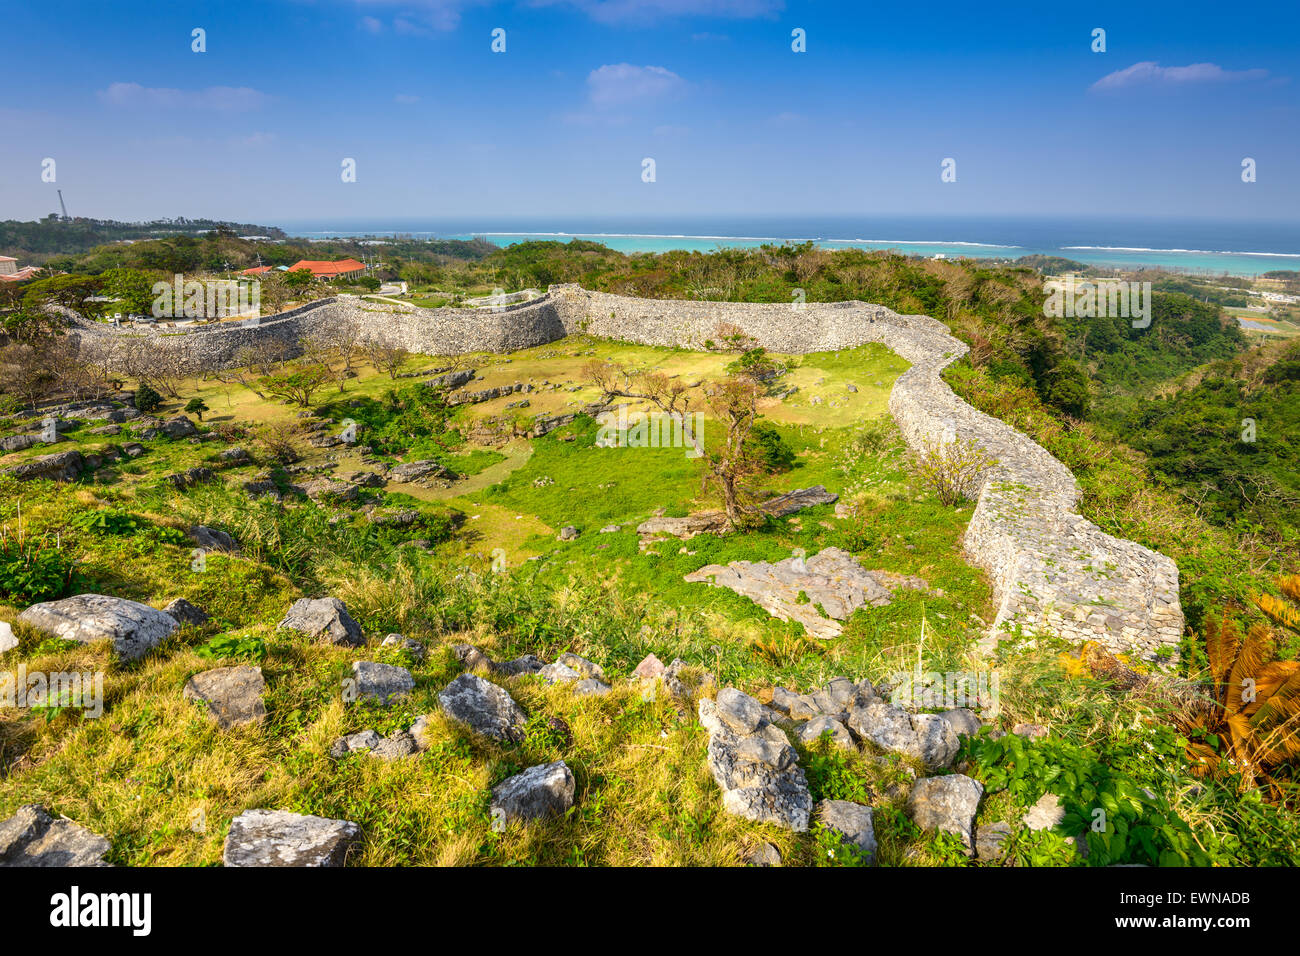 Okinawa, Japan auf Nakagusuku Burg Ruinen. Stockbild